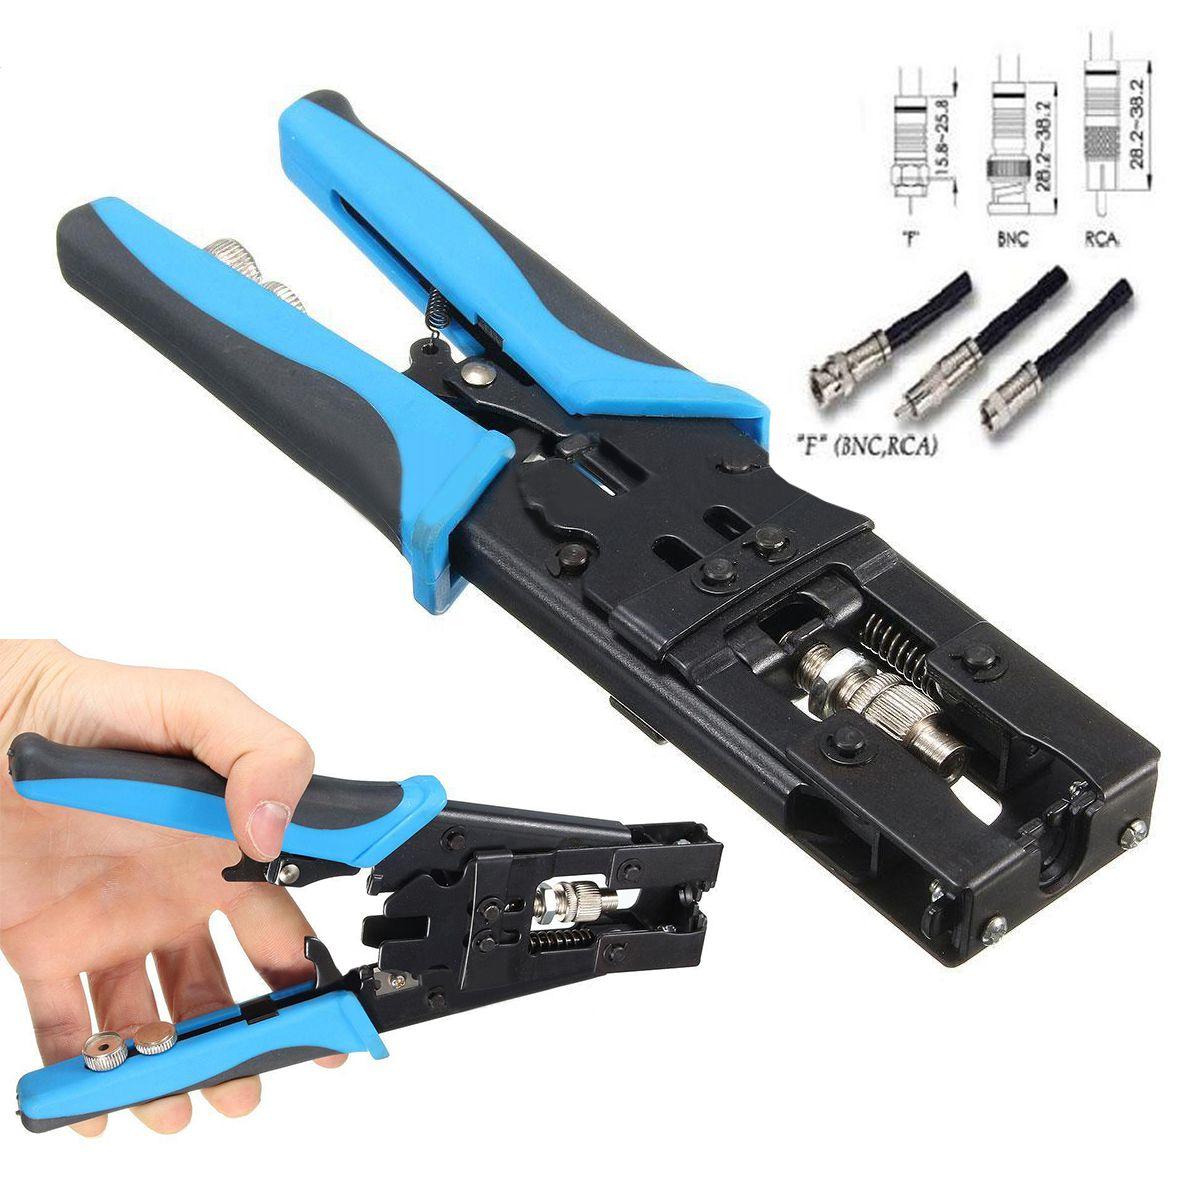 THGS 1pc Durable Coax Compression Crimper Tool BNC/RCA/F Crimp Connector RG59/58/6 Cable Wire Cutter Adjustable Crimping Plier